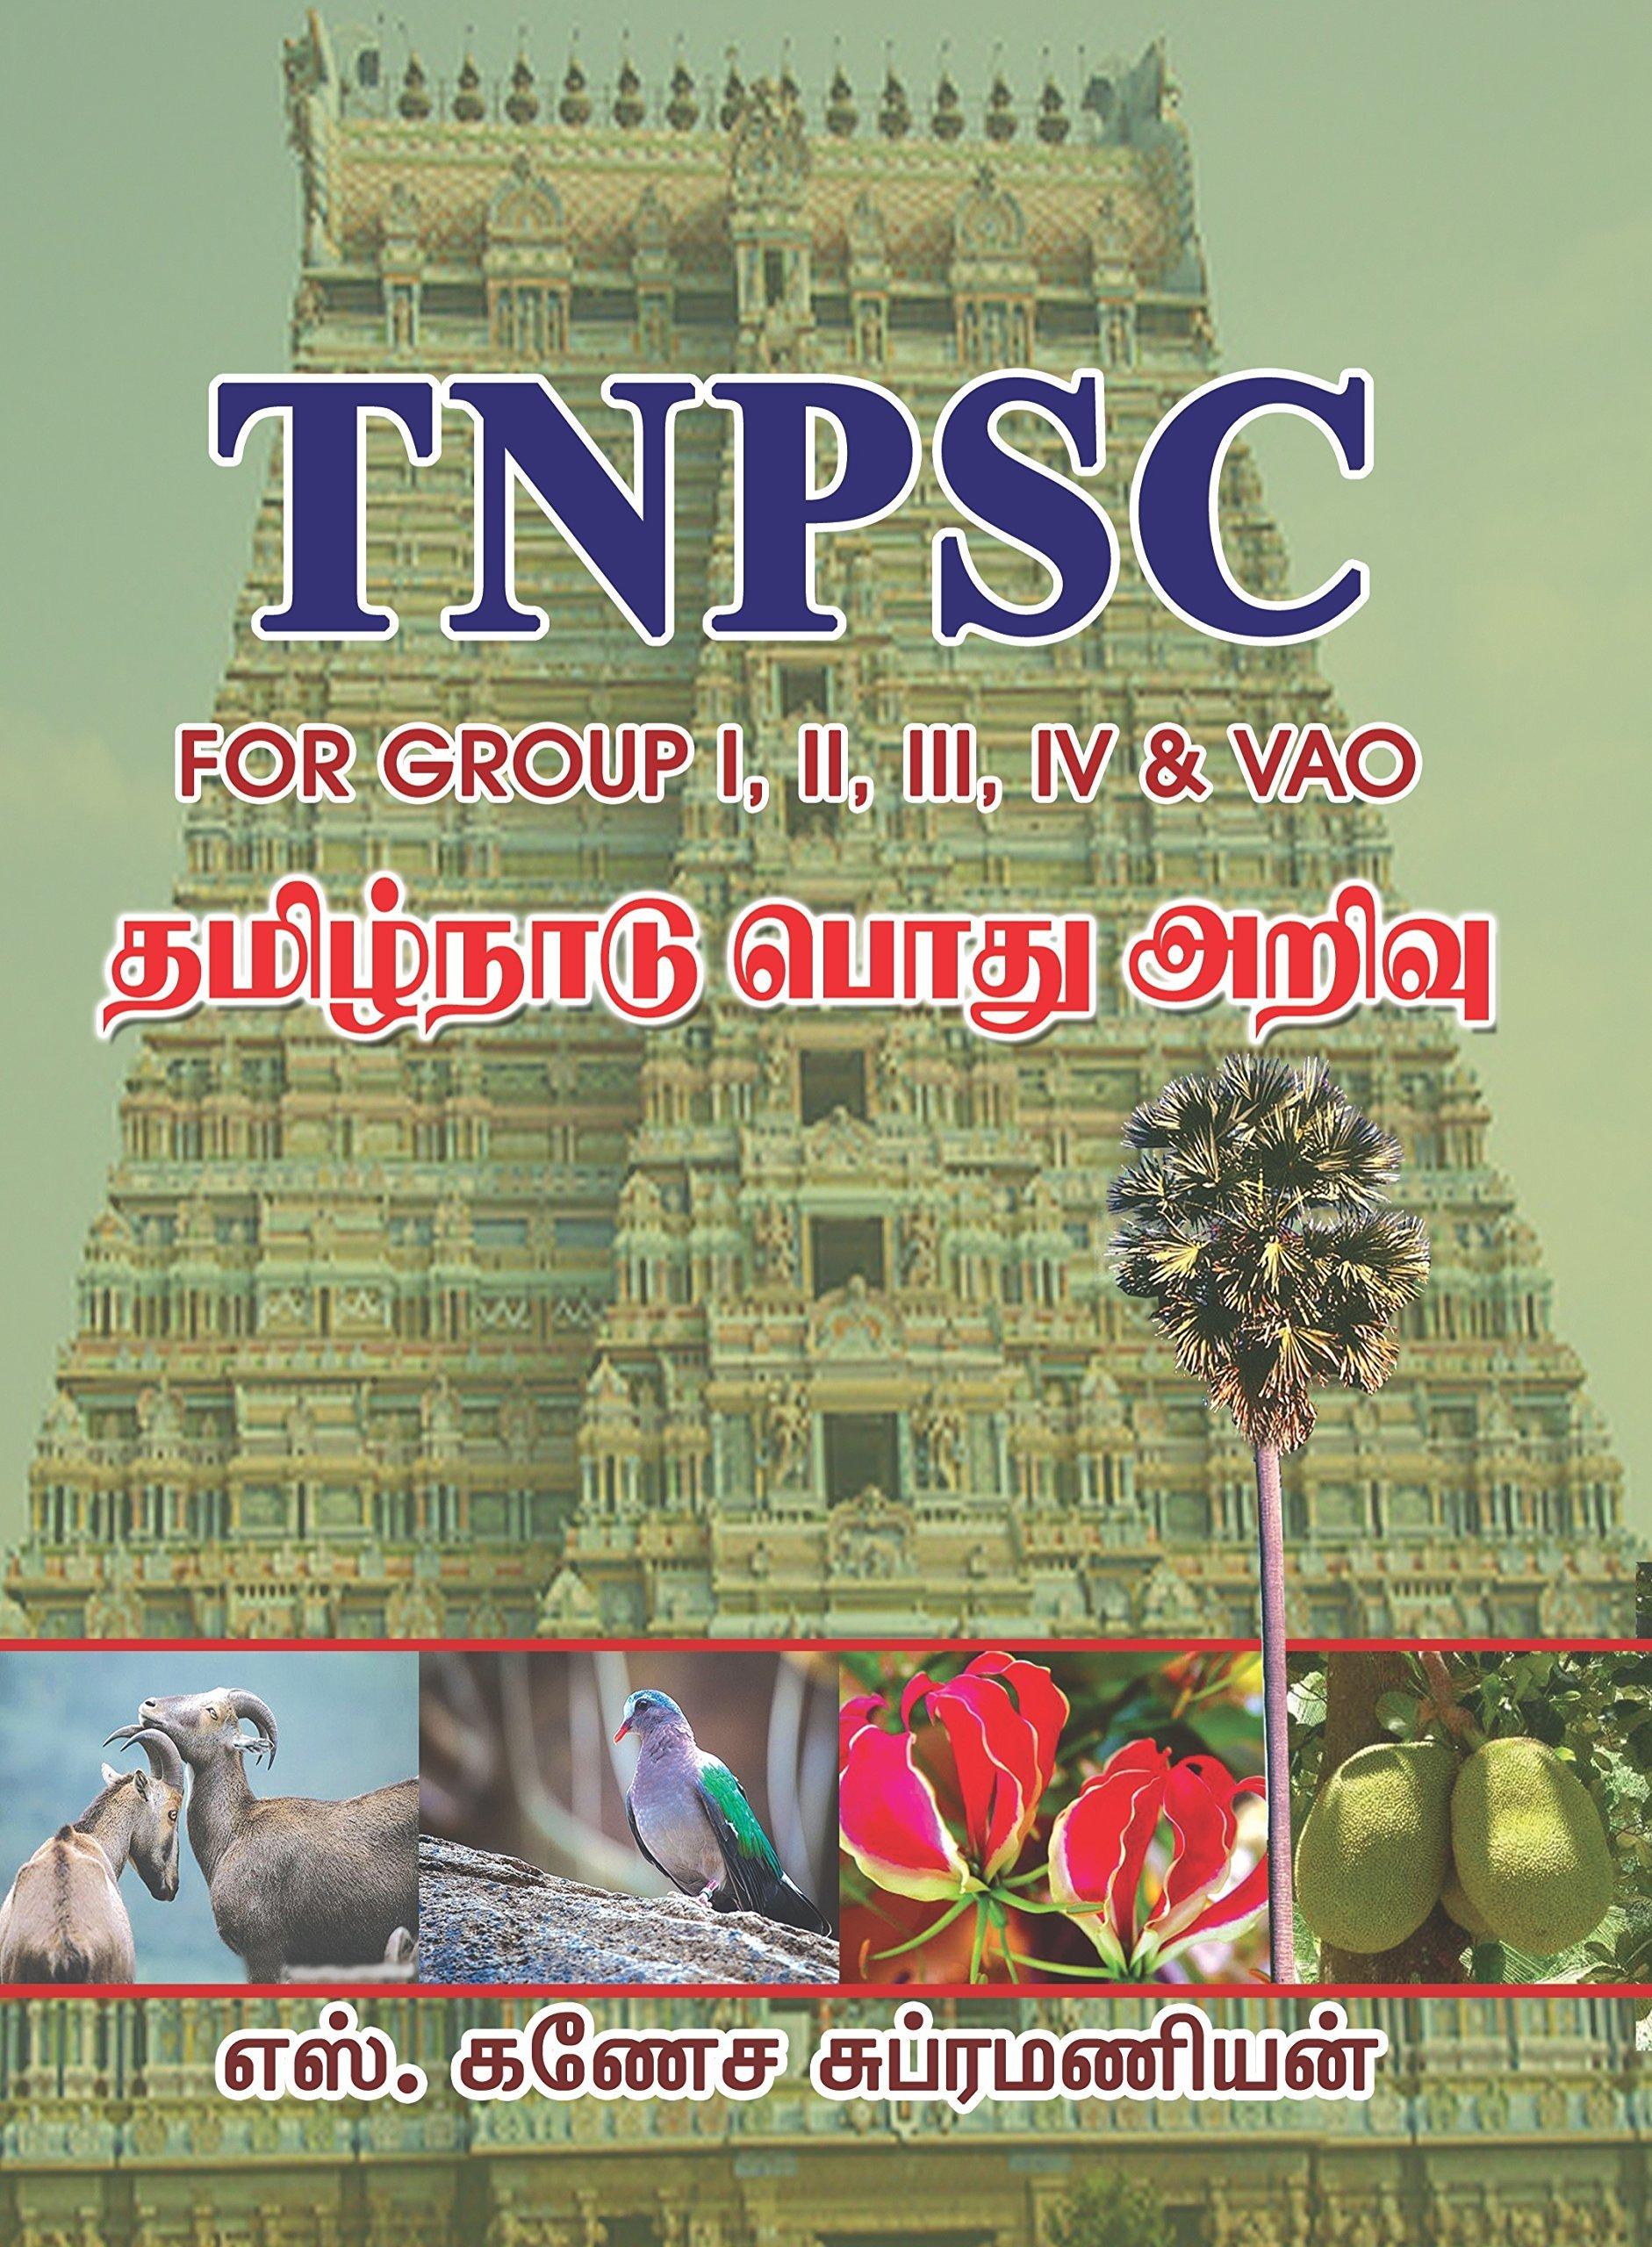 Buy Tamil Nadu Pothu Arivu - தமிழ் நாடு பொது அறிவு